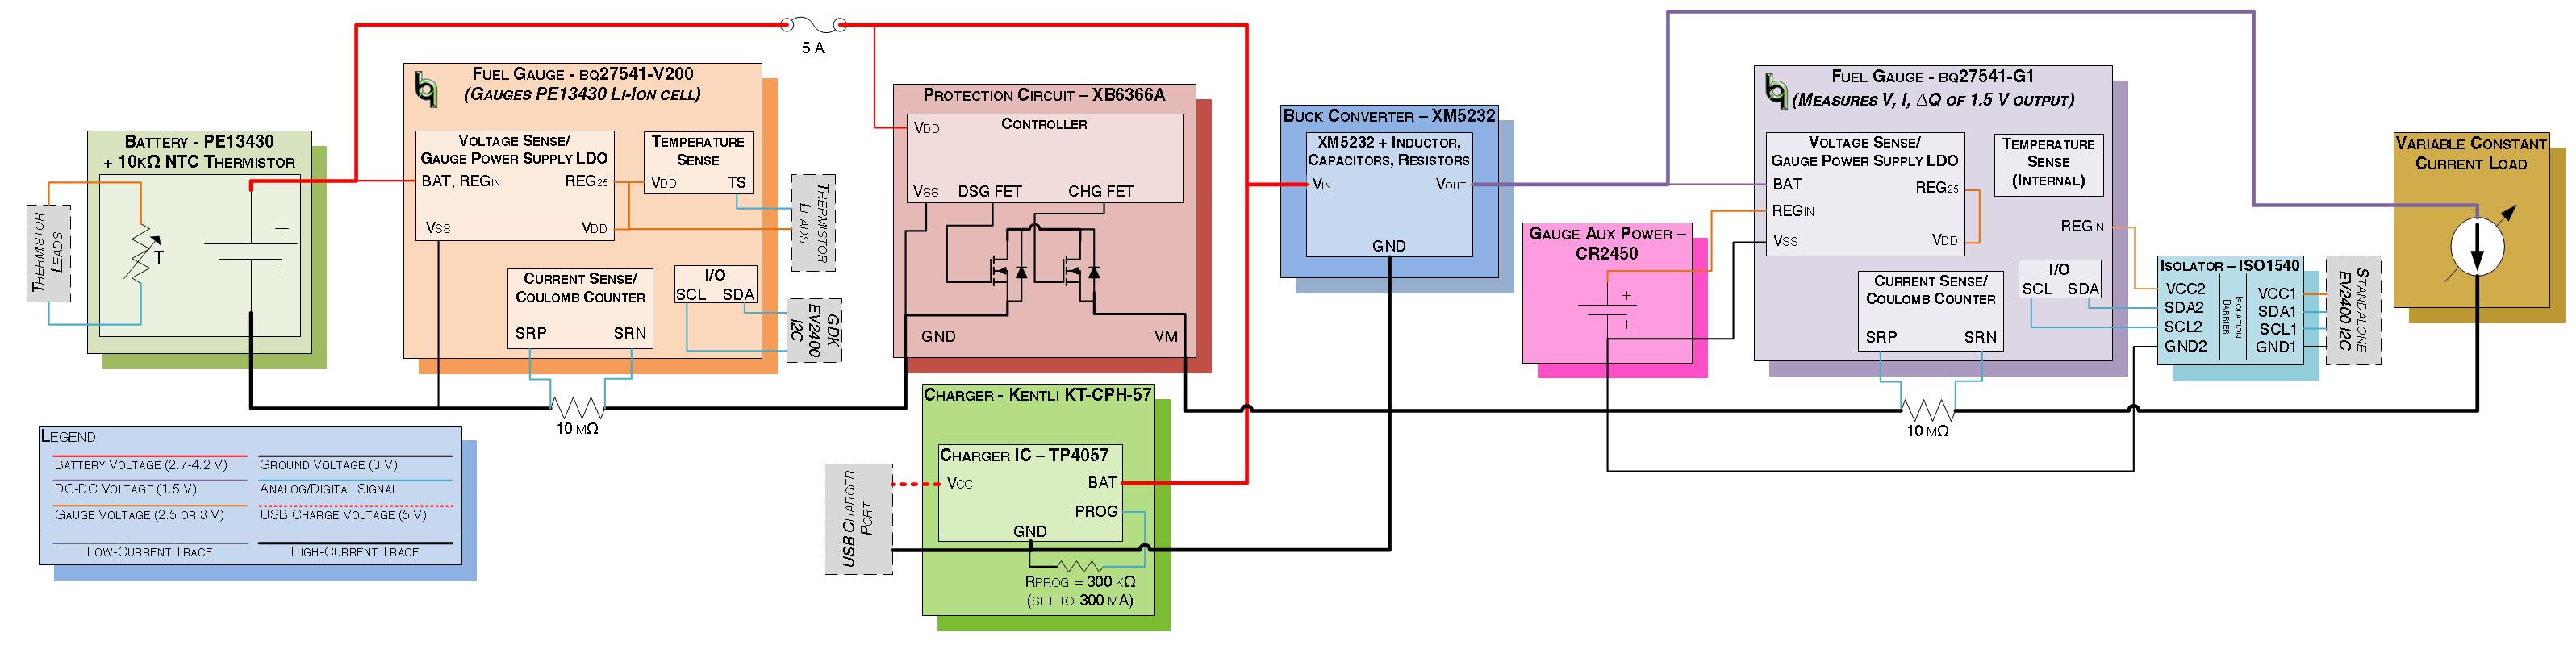 ph5 cycle test setup diagram